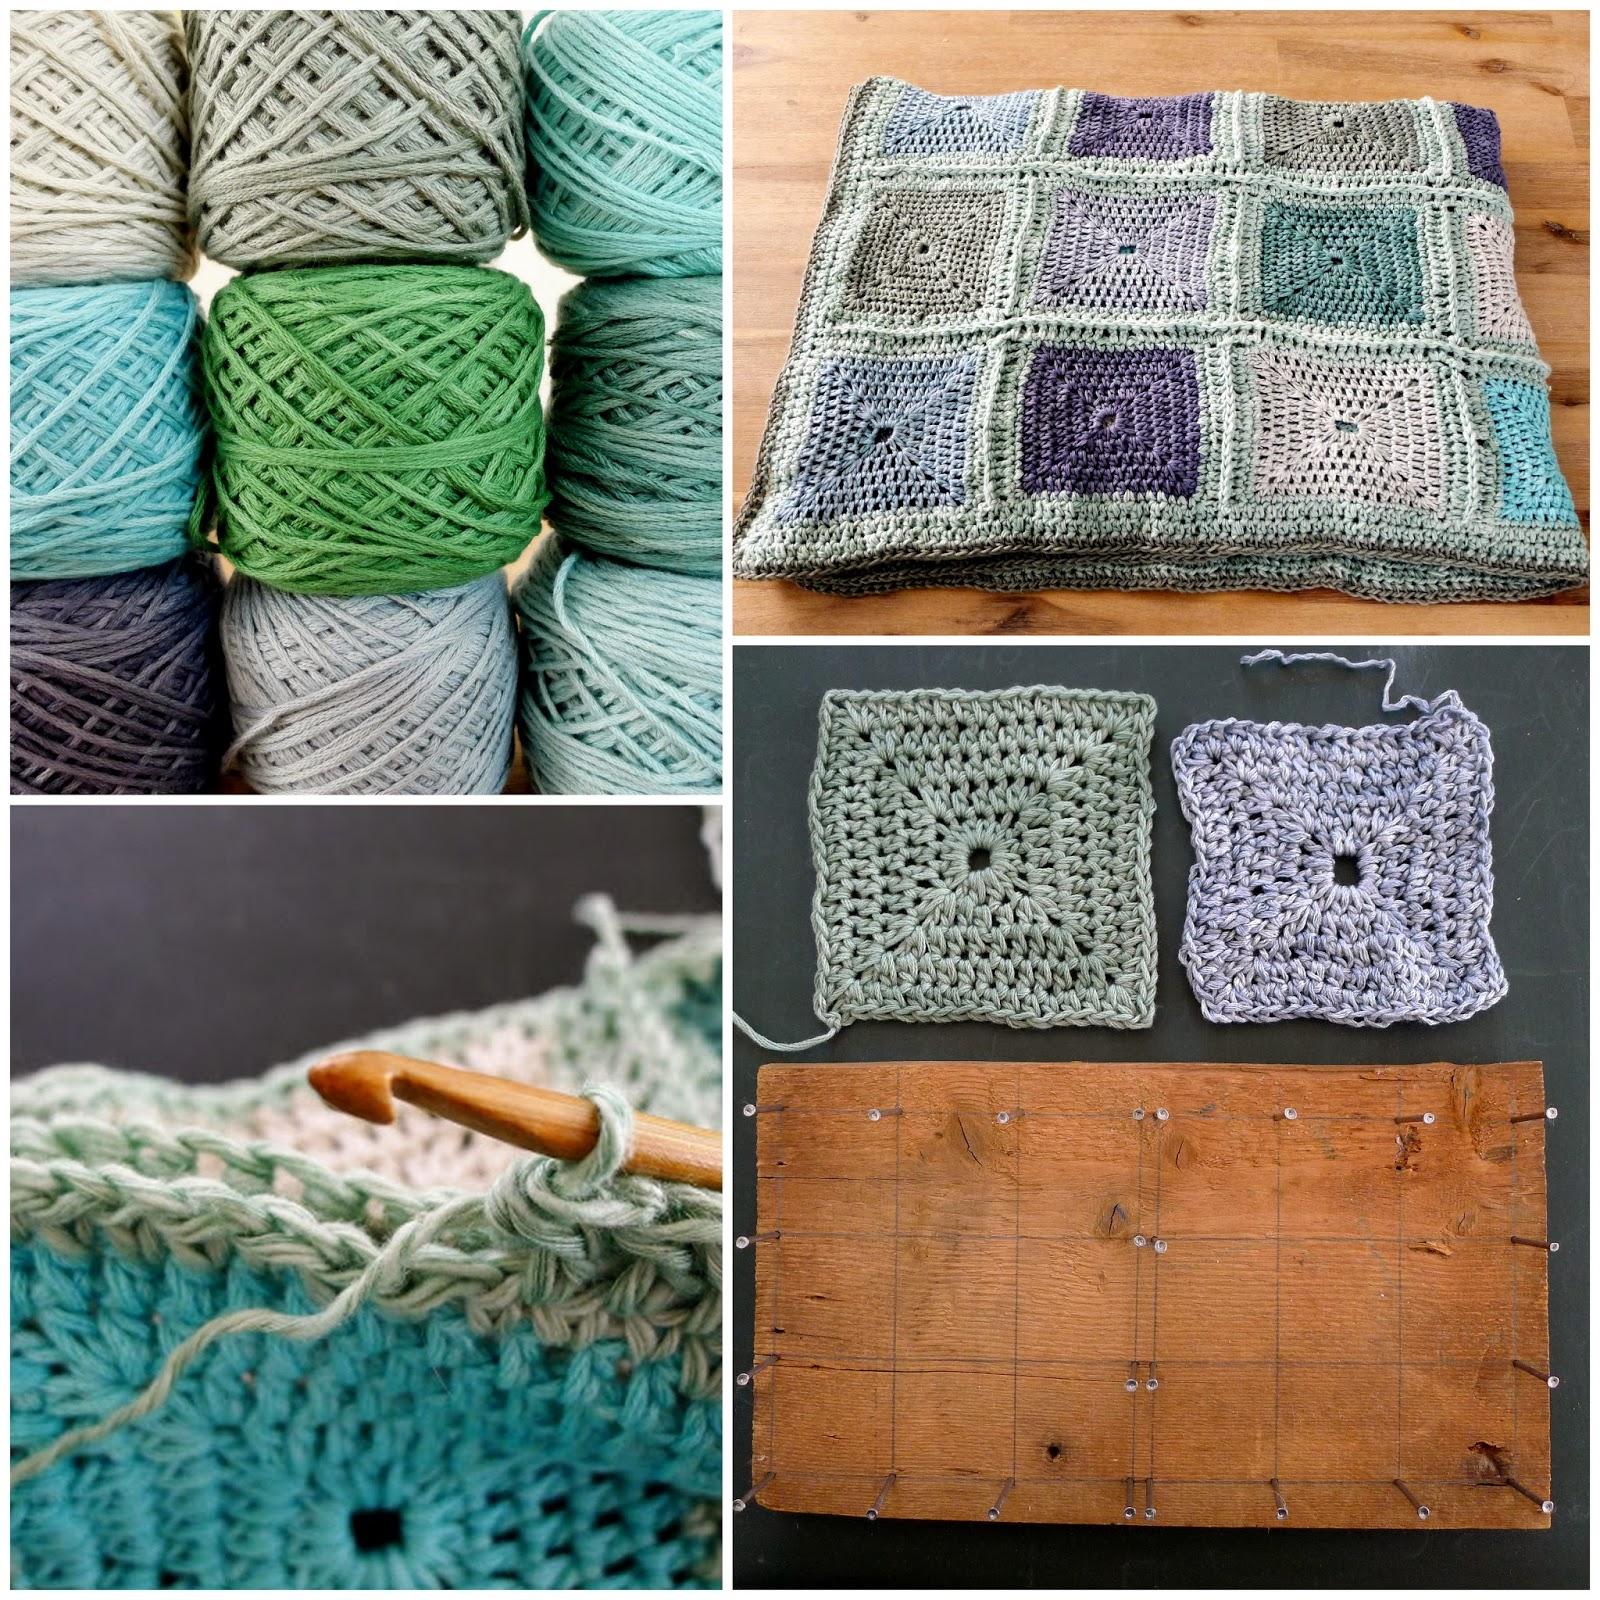 Elize Shawl 2. Placemat 3. Shell Crochet Scarf 4. Mandala